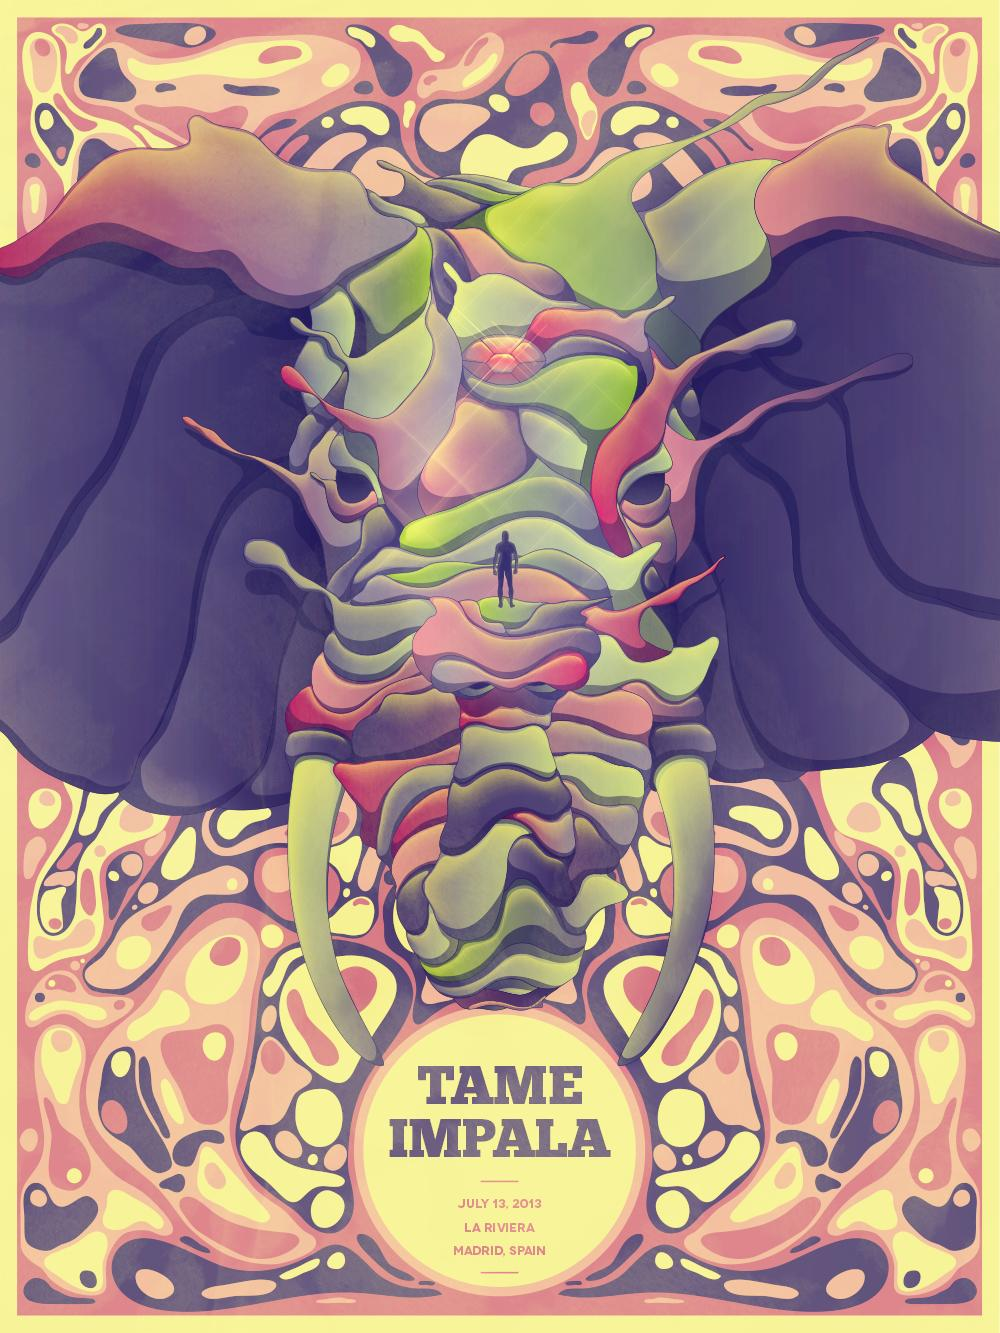 Tame Impala · Madrid, Spain - image 1 - student project